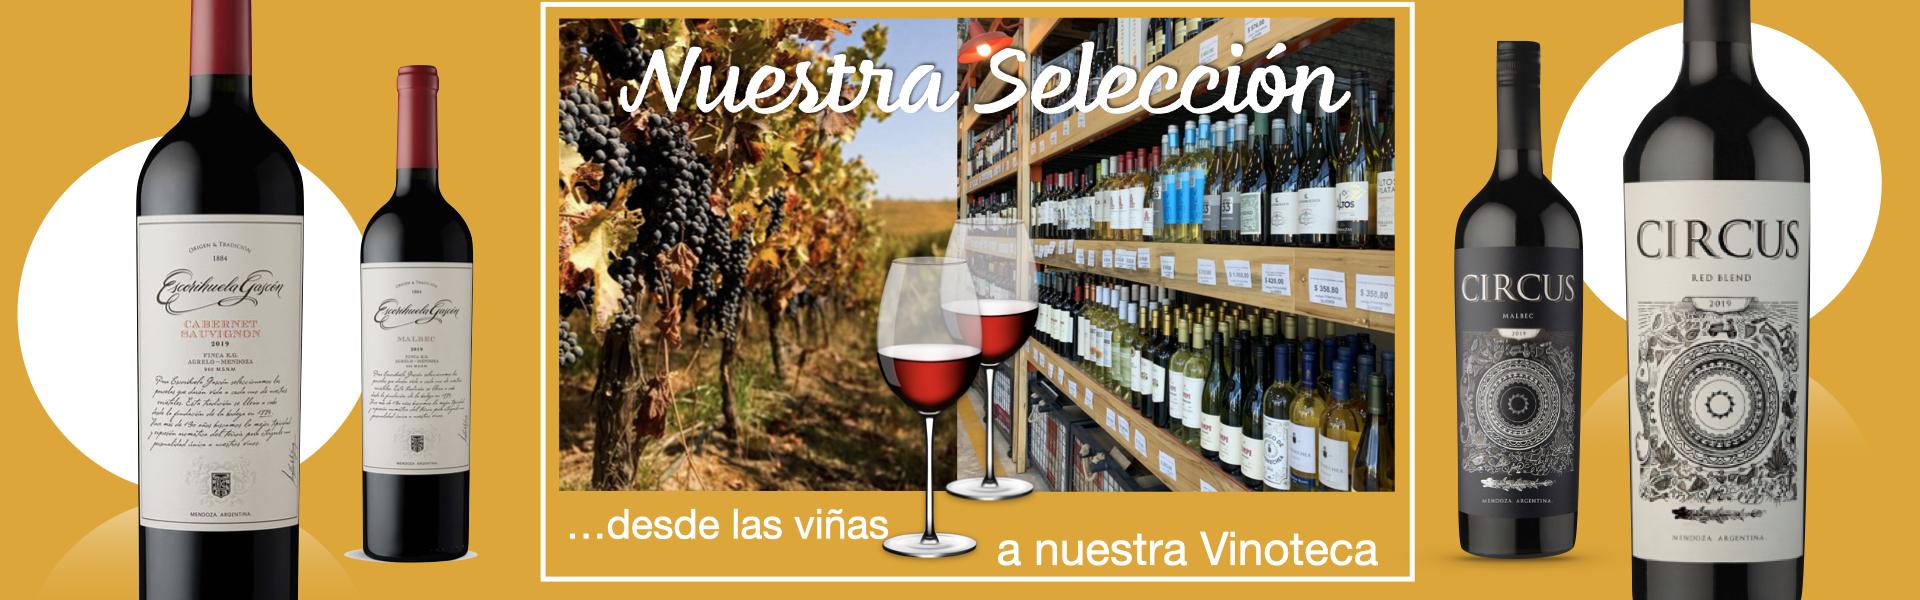 vinos long web.001